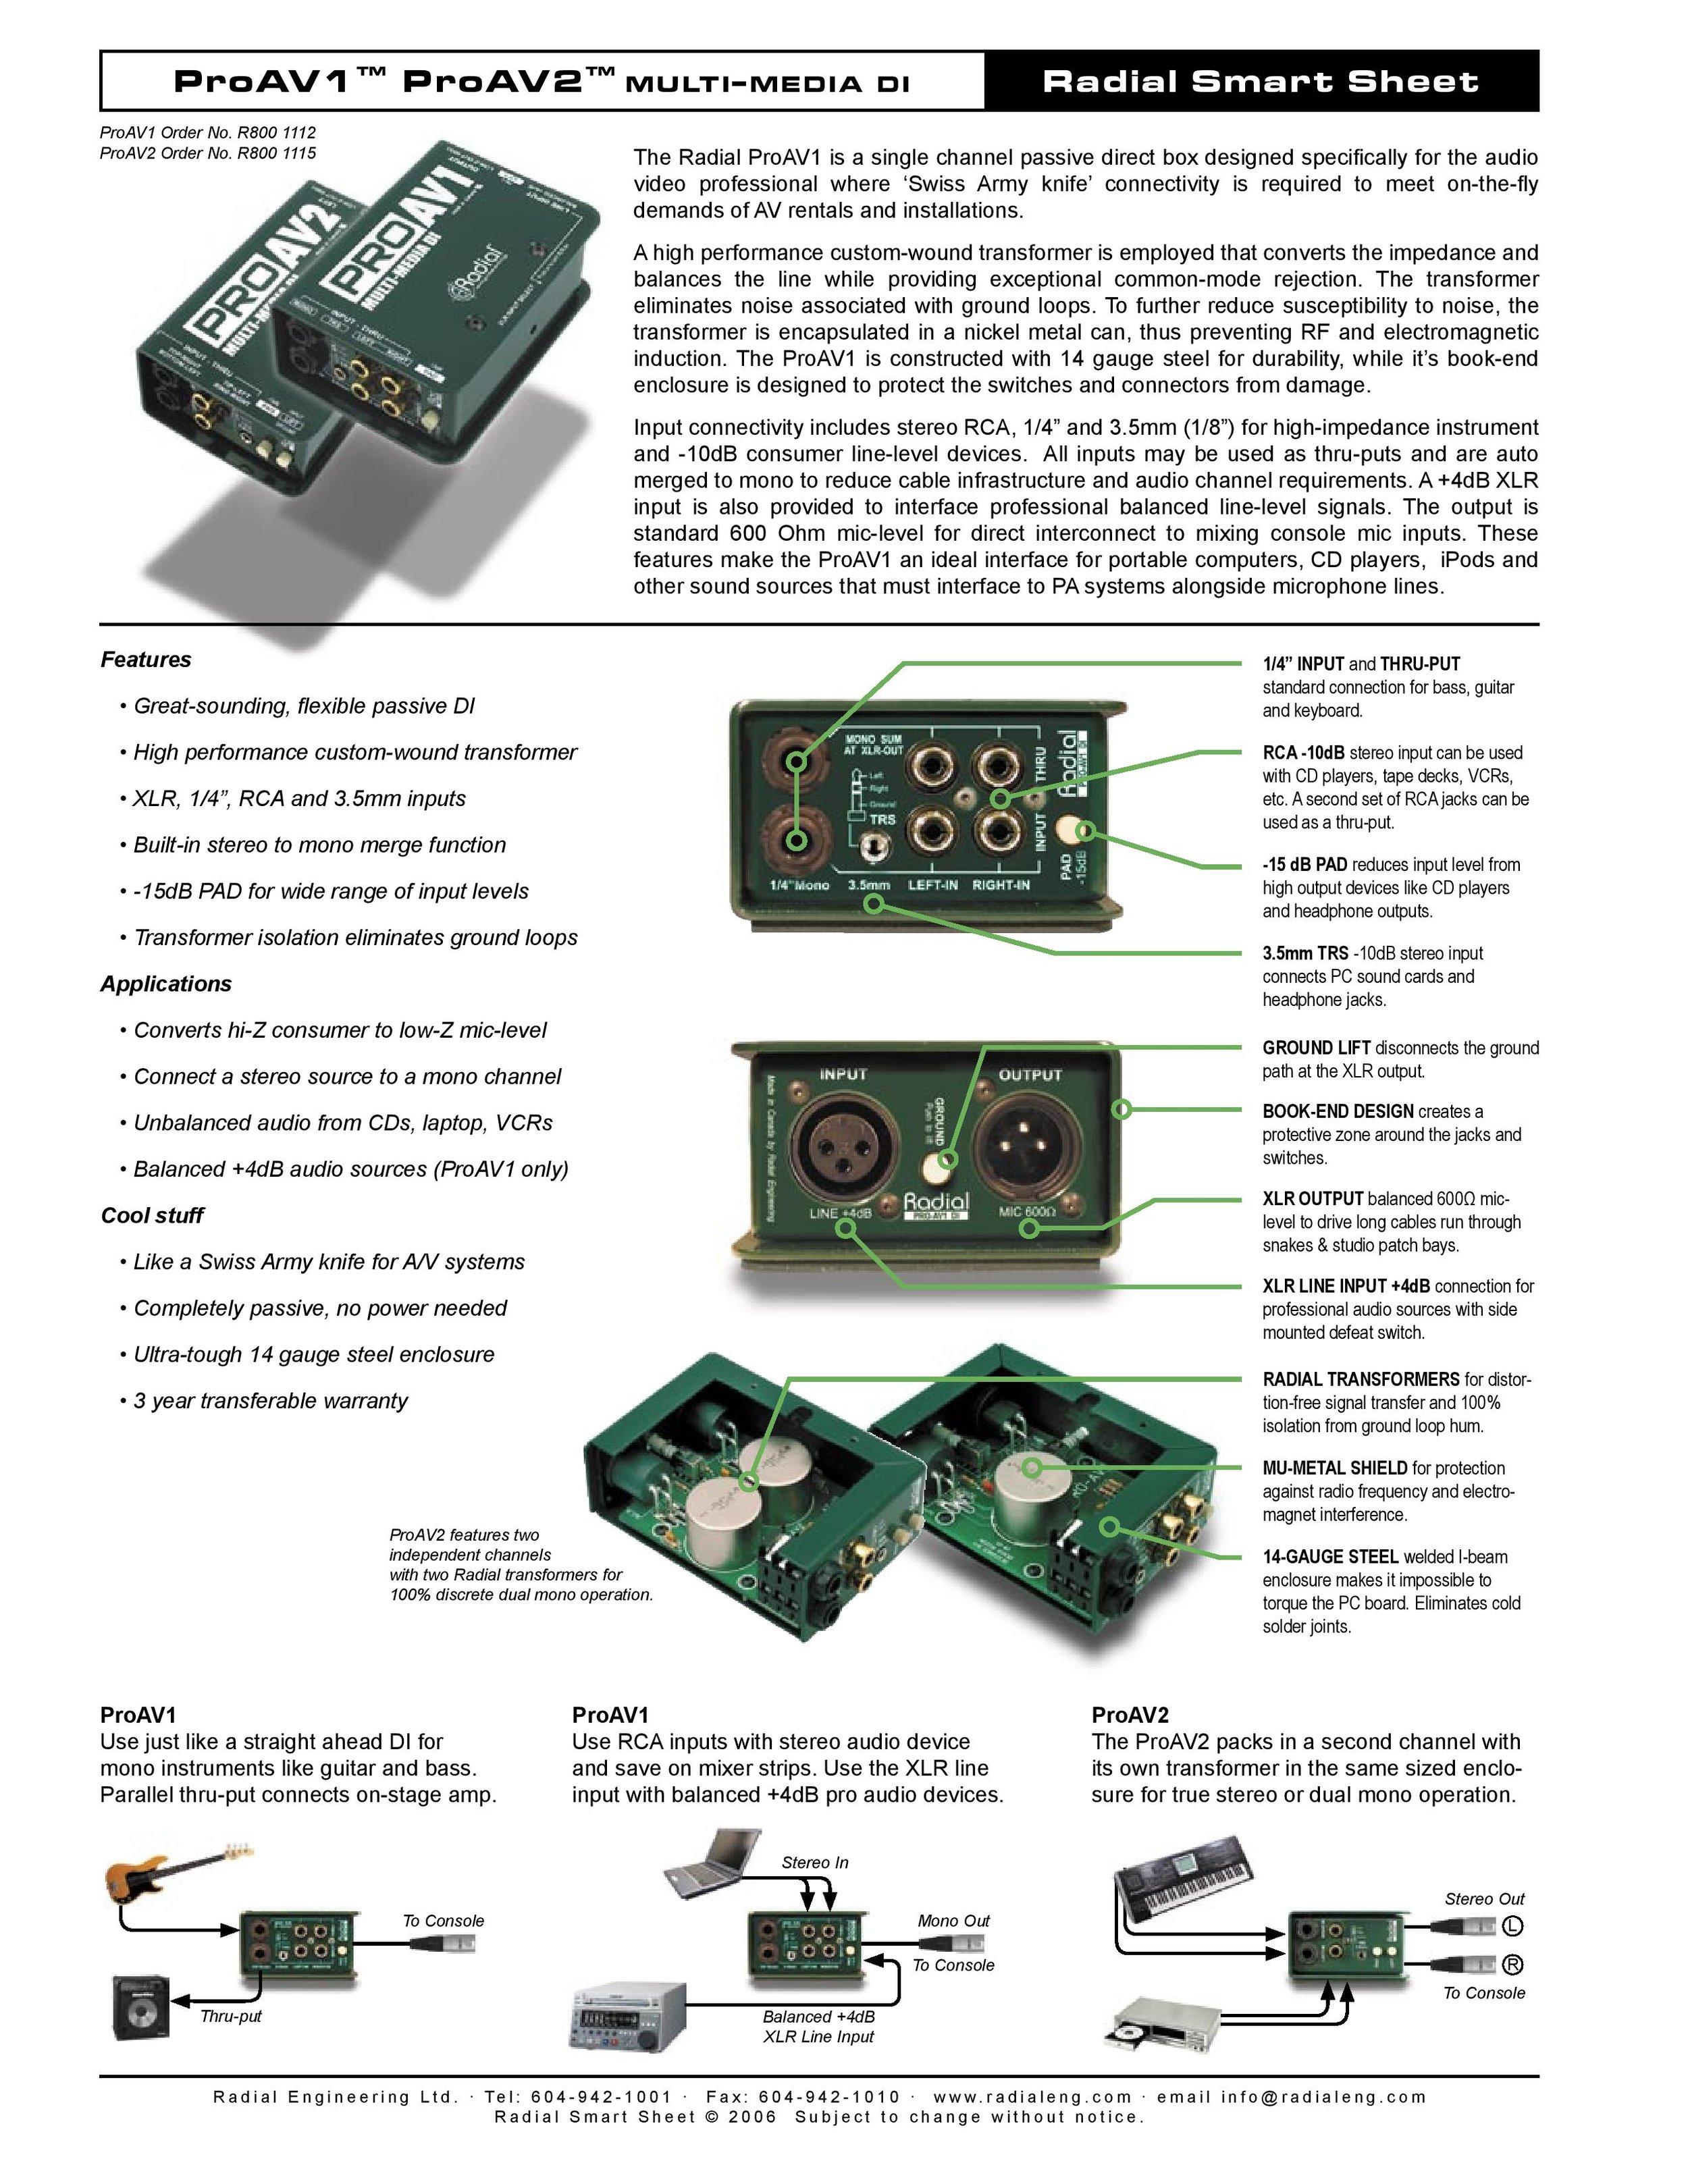 smartsheet-radial-proav1-page-001.jpg